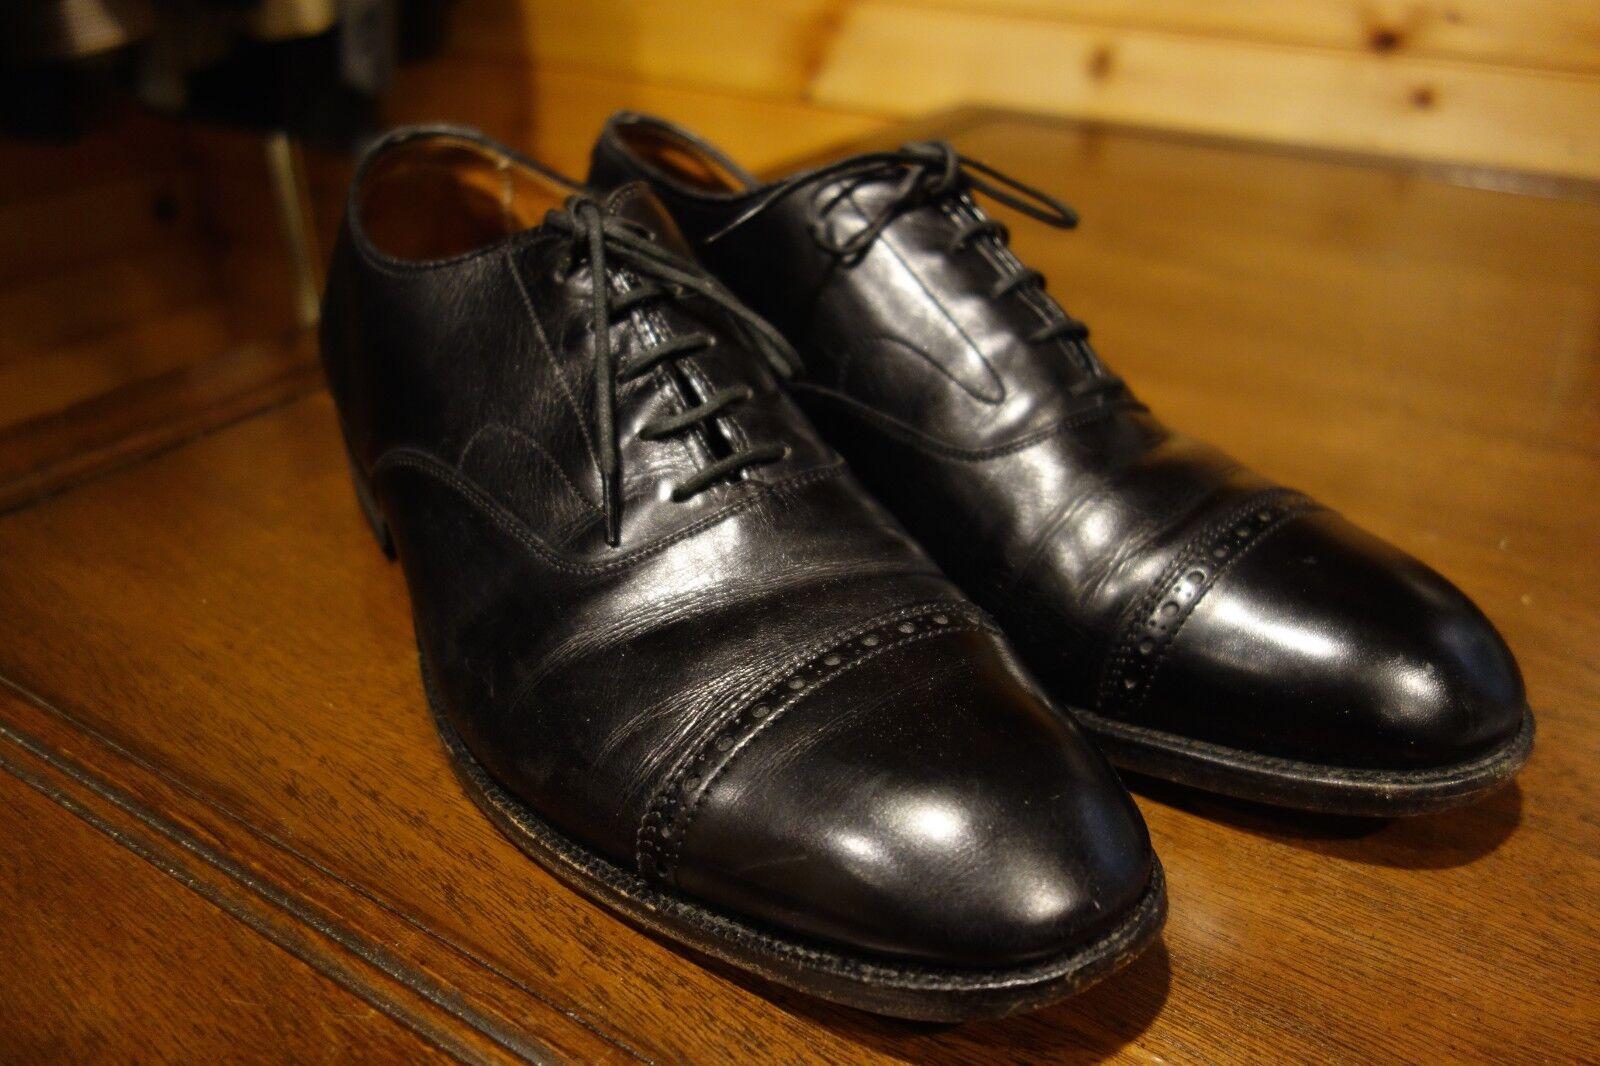 Alden Stunning Black Cap Toe Oxford Dress shoes 10 A C USA